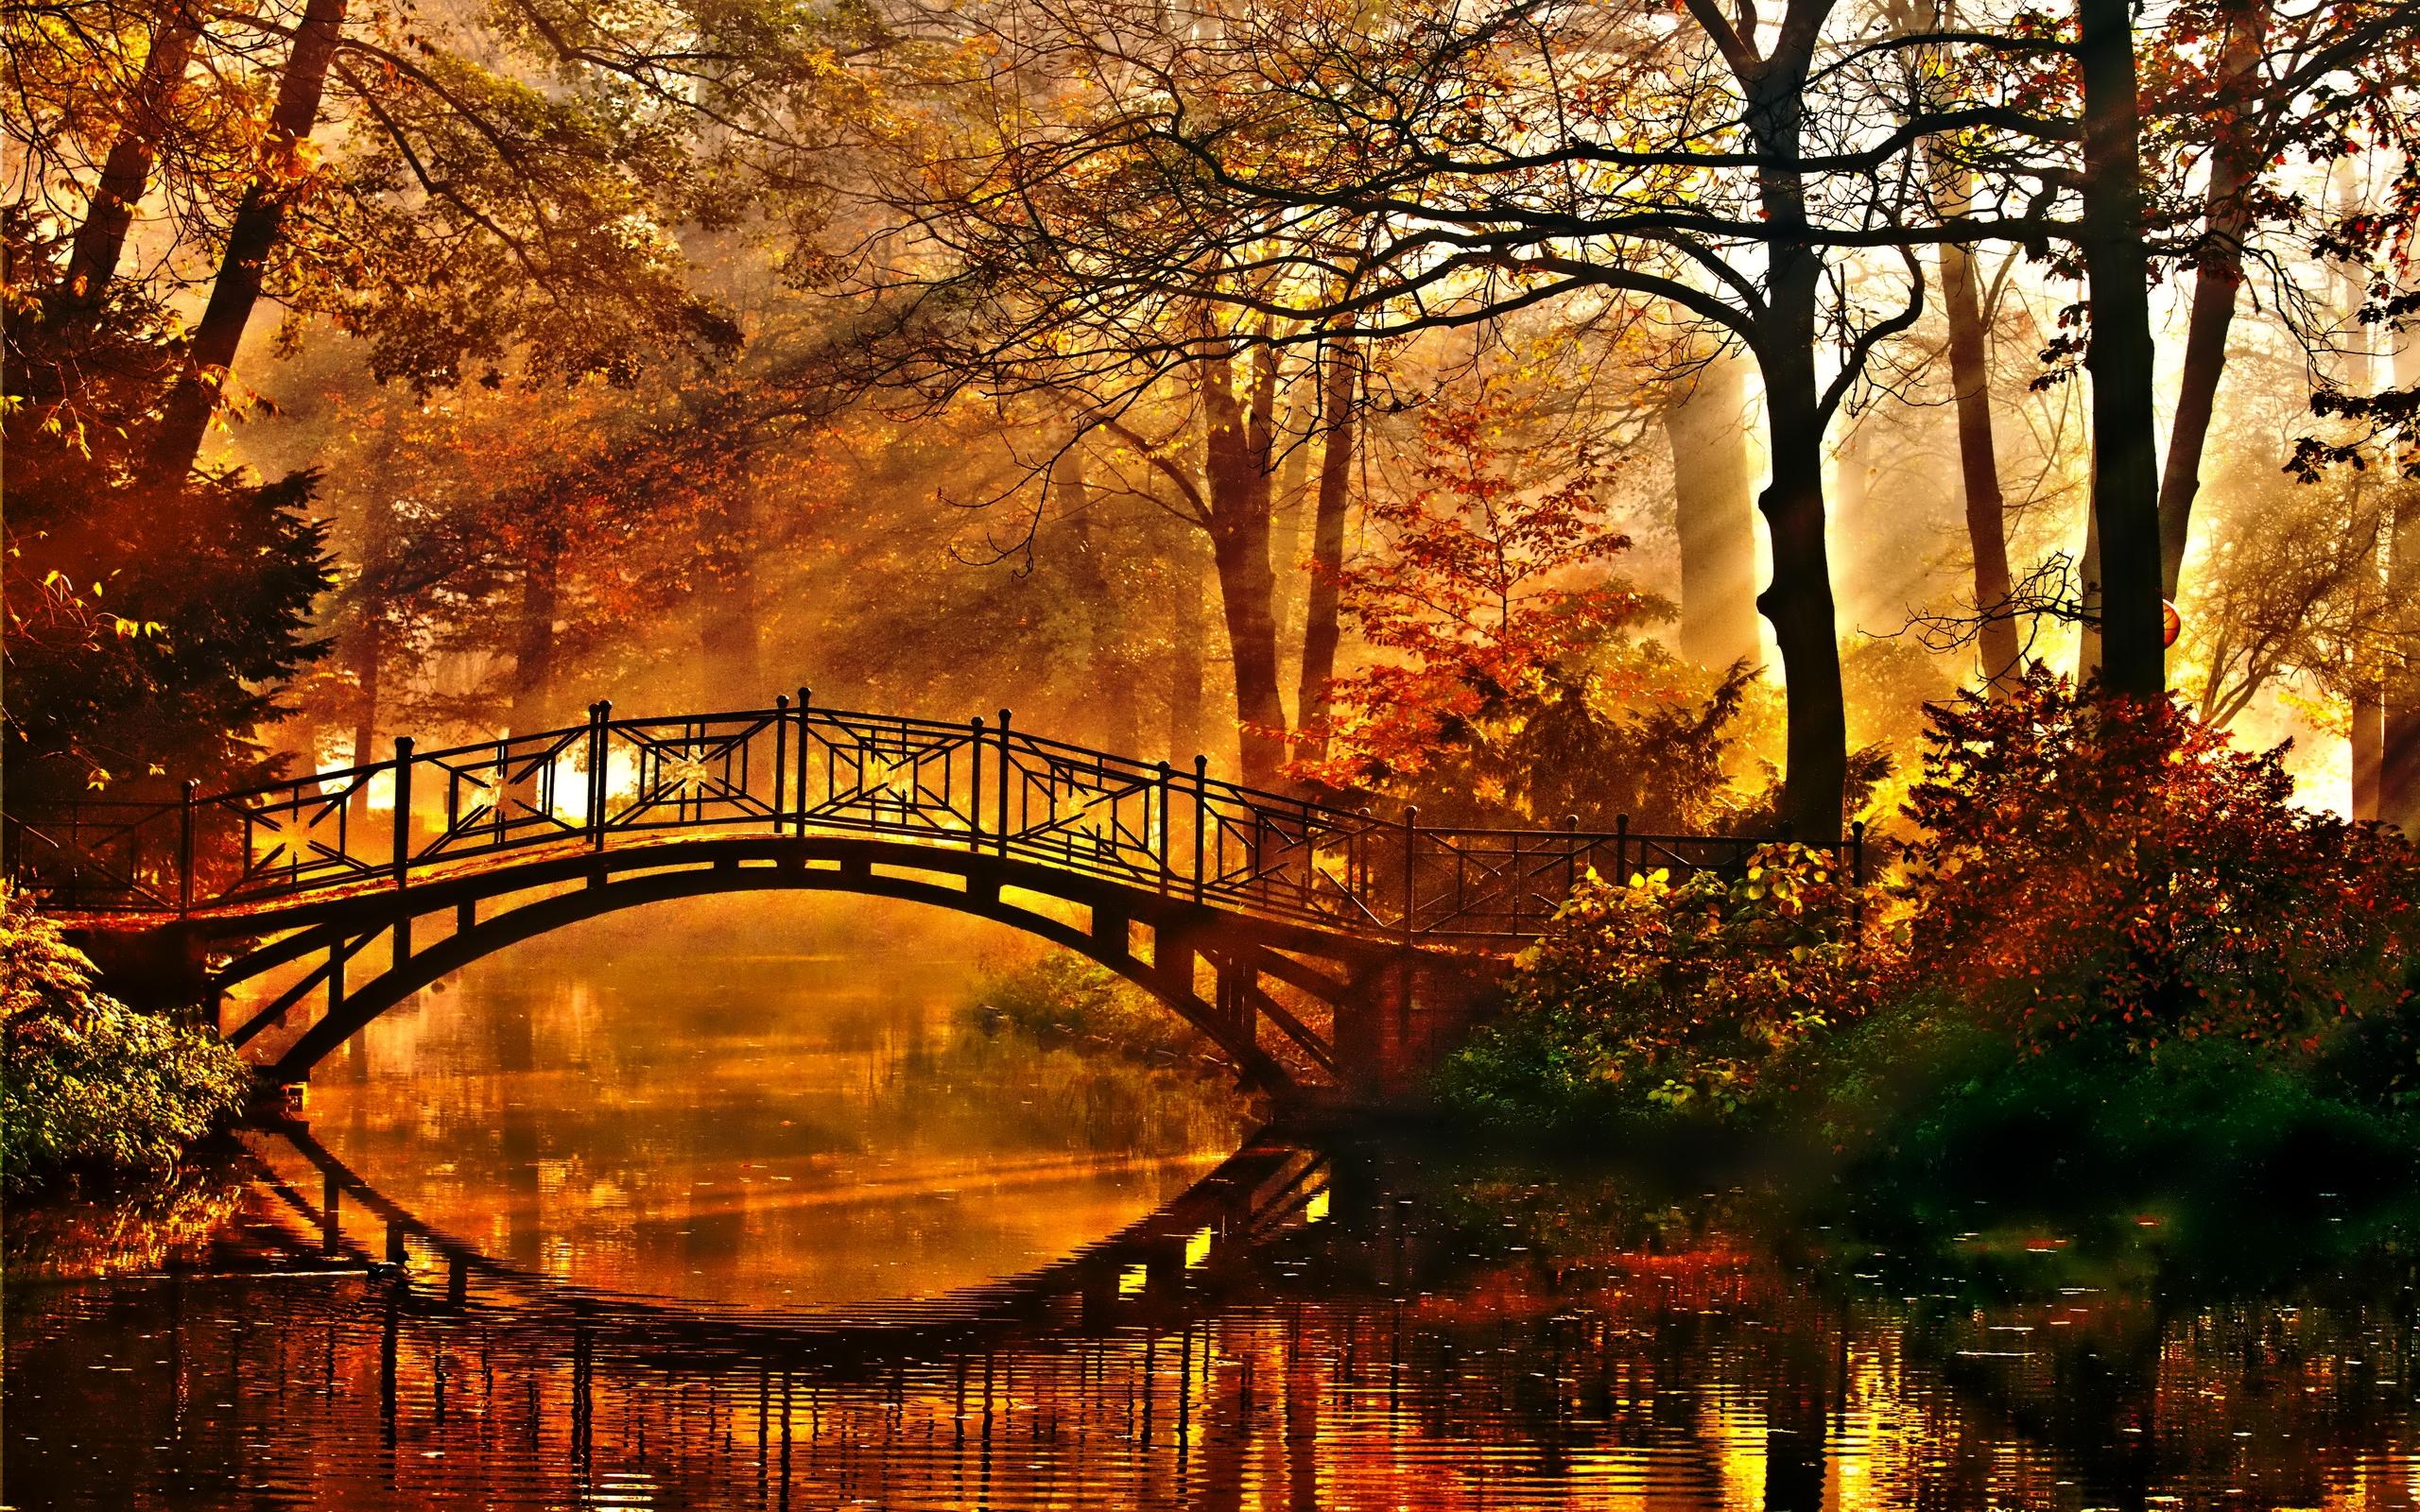 Sunshine On Autumn Forest Bridge Hd Wallpaper Background